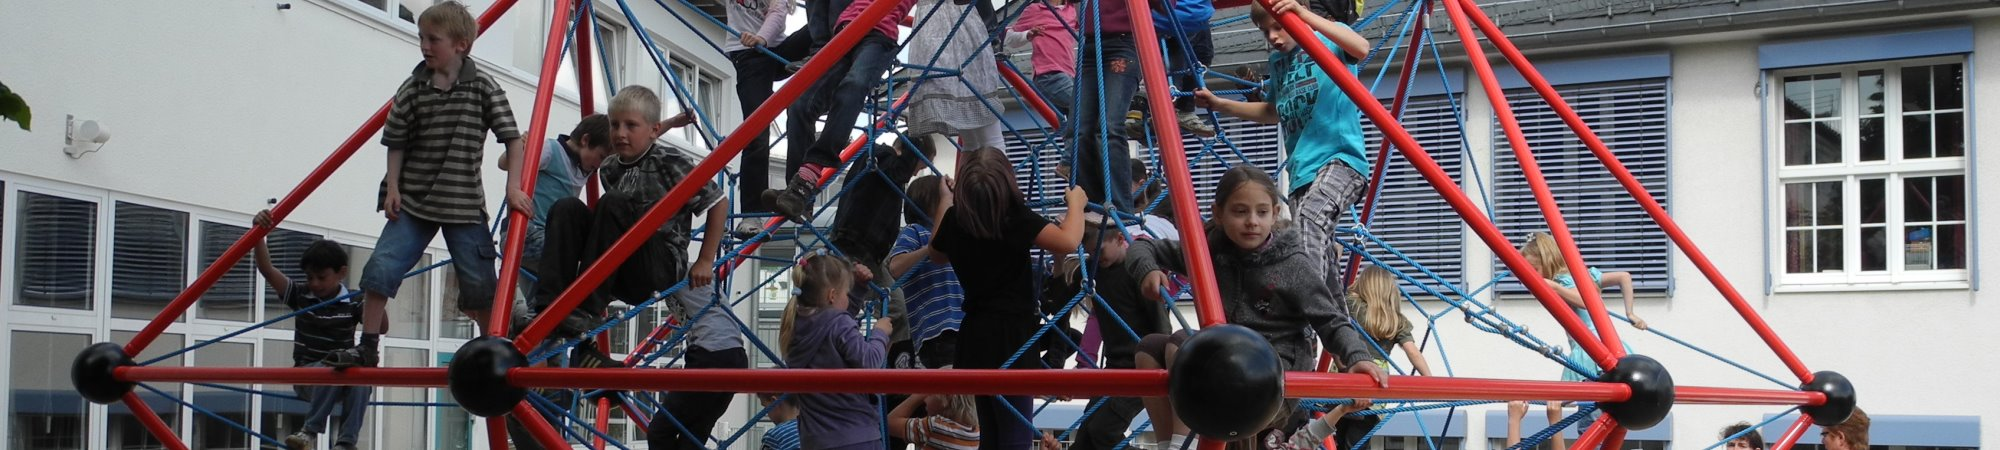 Klettergerüst an der Grundschule Burbach